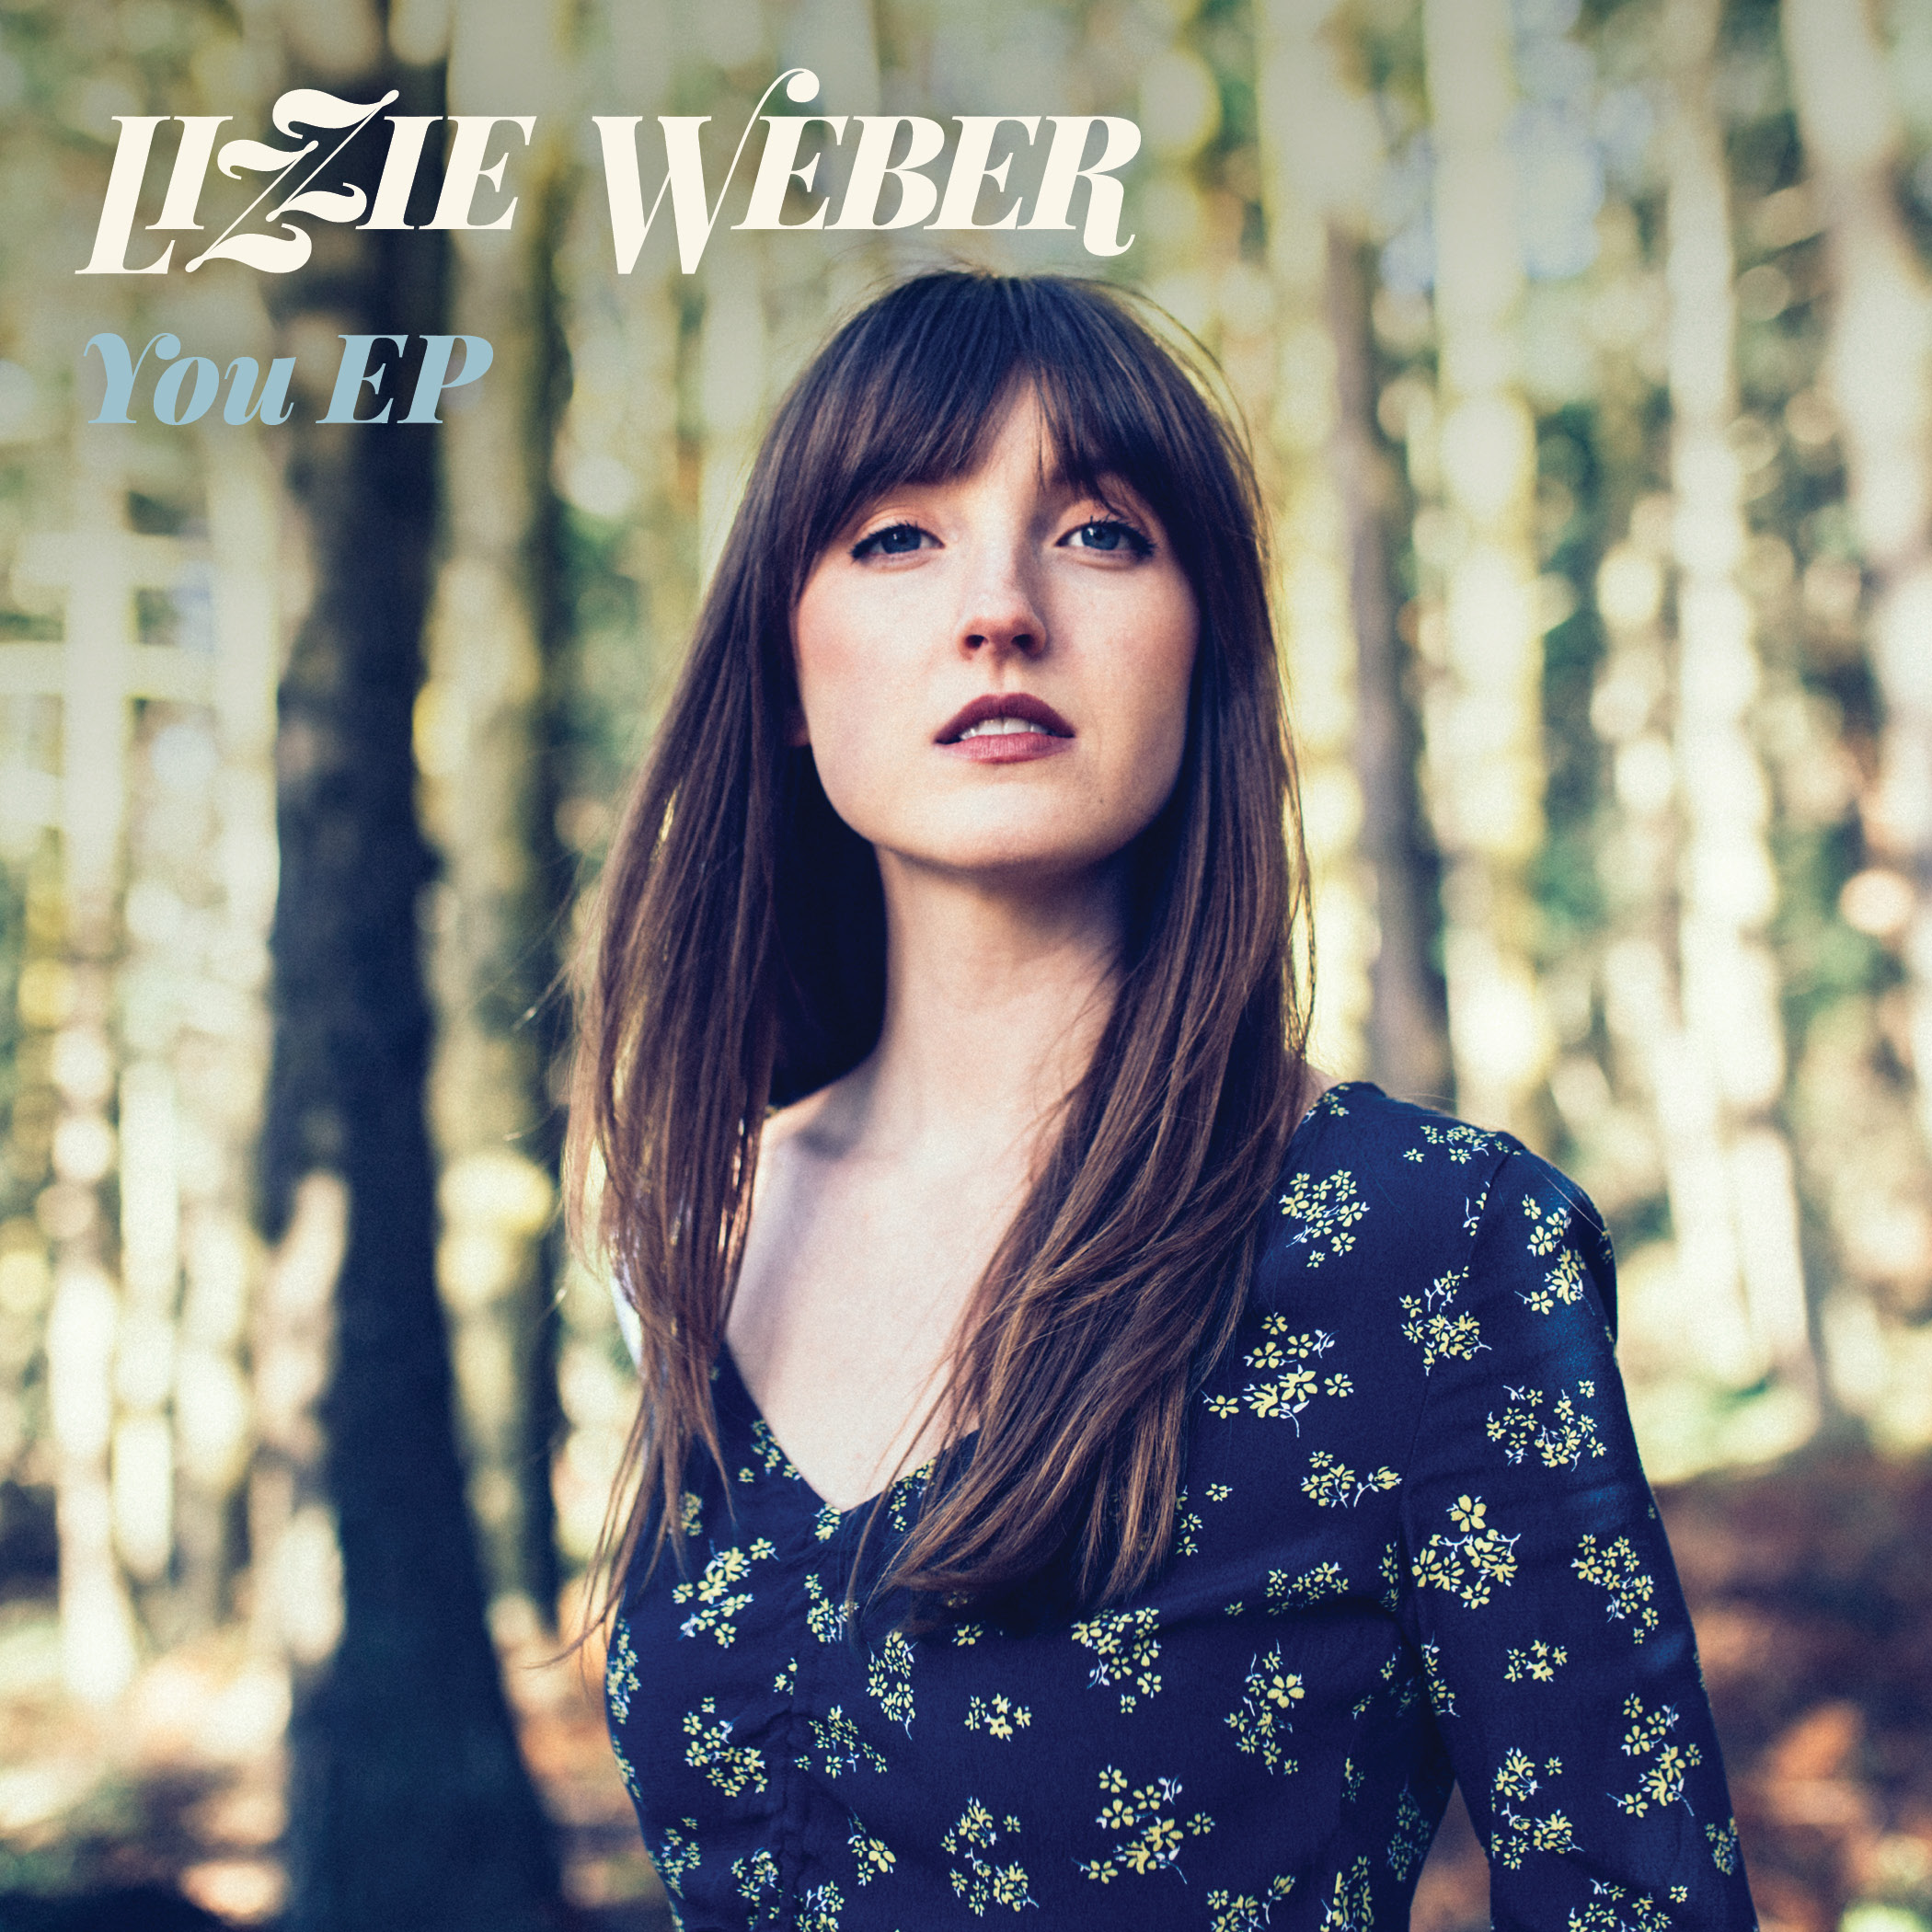 Lizzie_Weber-YouEP.jpg